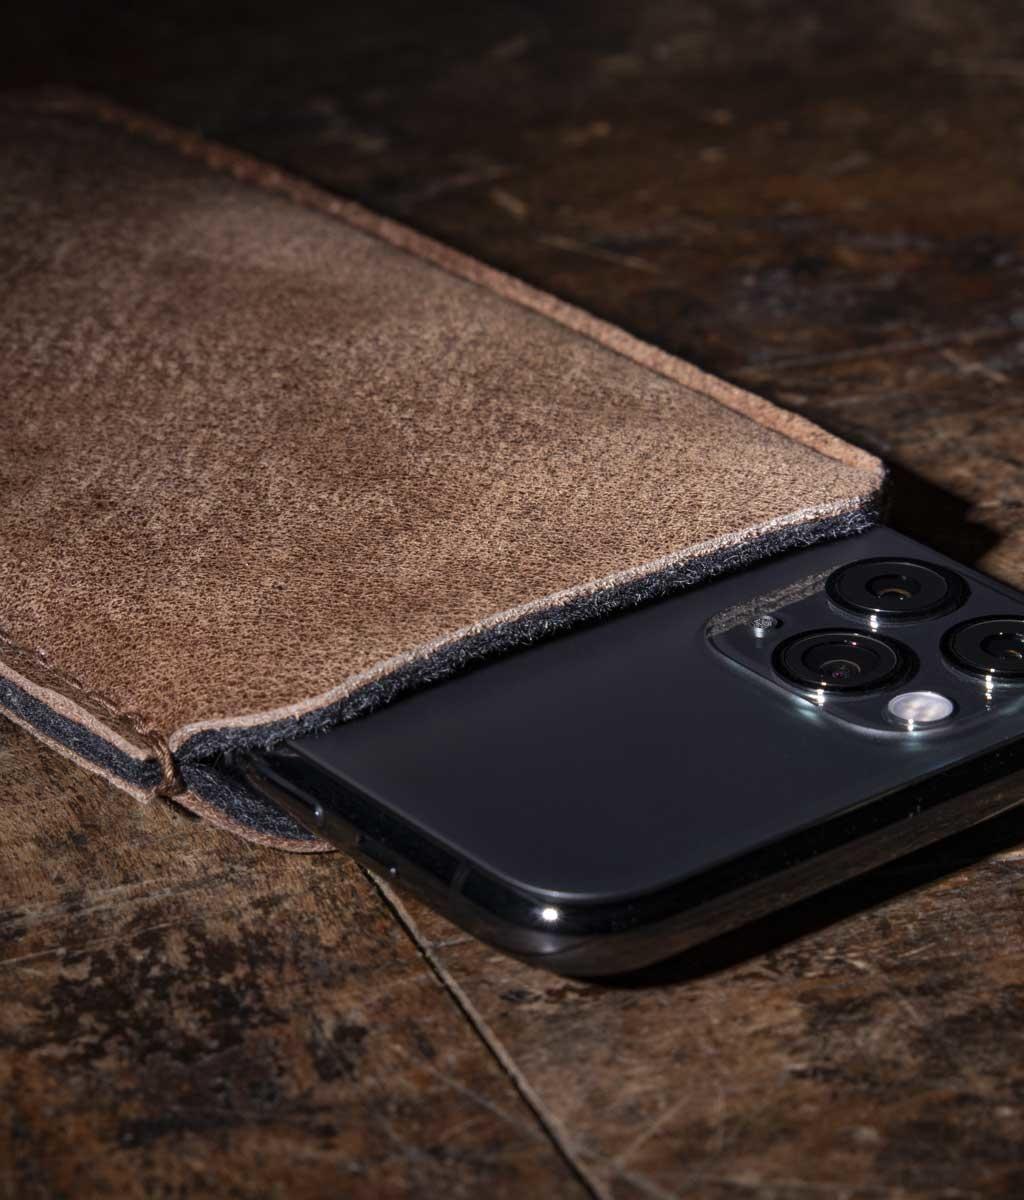 iPhone 12 11 Pro SE Max mini XR 8 Ledertasche, Lederhülle mit Filz Futter DATENSCHUTZ